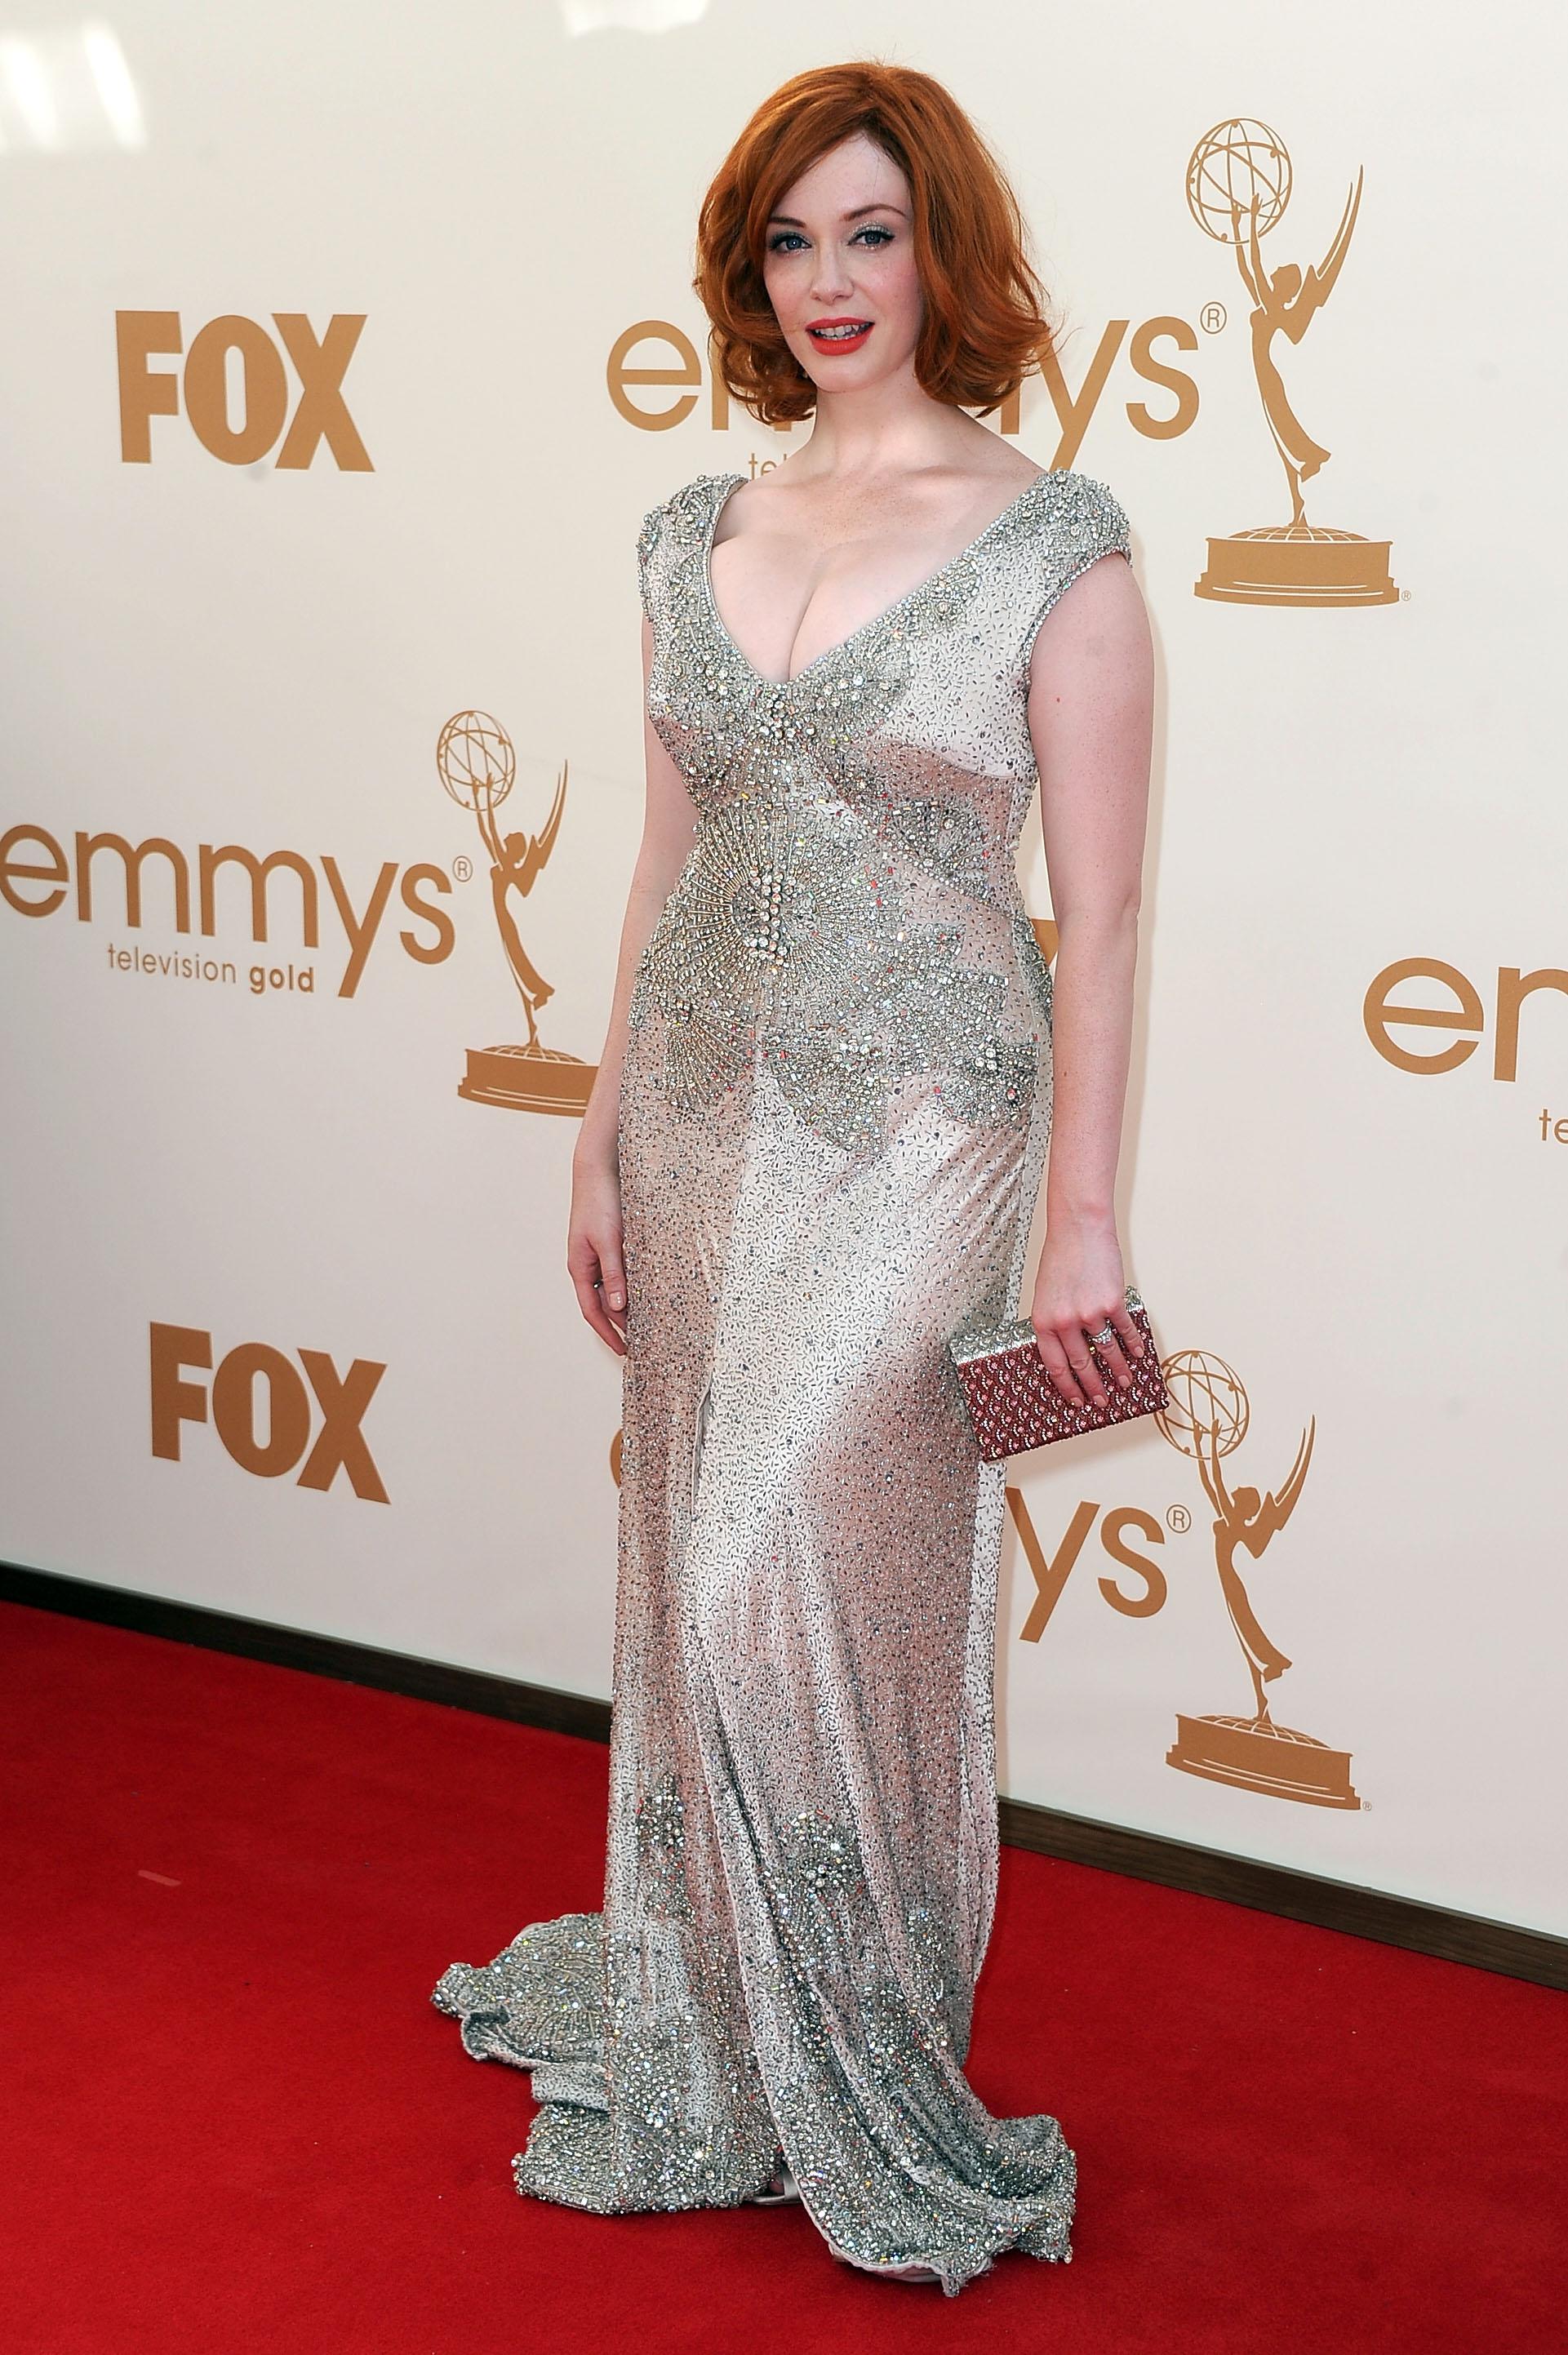 Christina Hendricks at the 2011 Emmys.